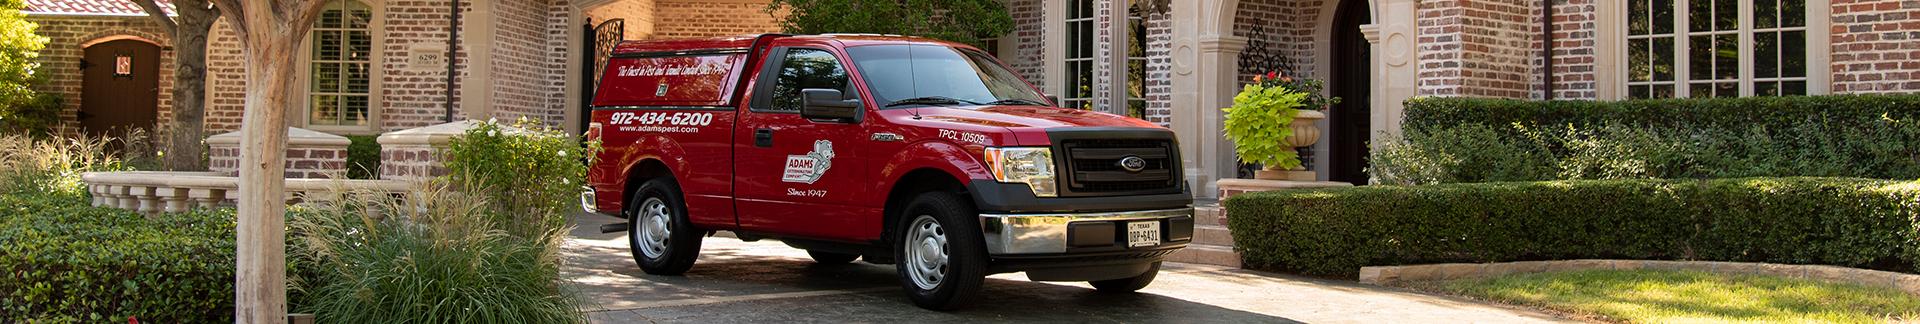 adams pest control's truck in north richland hills tx